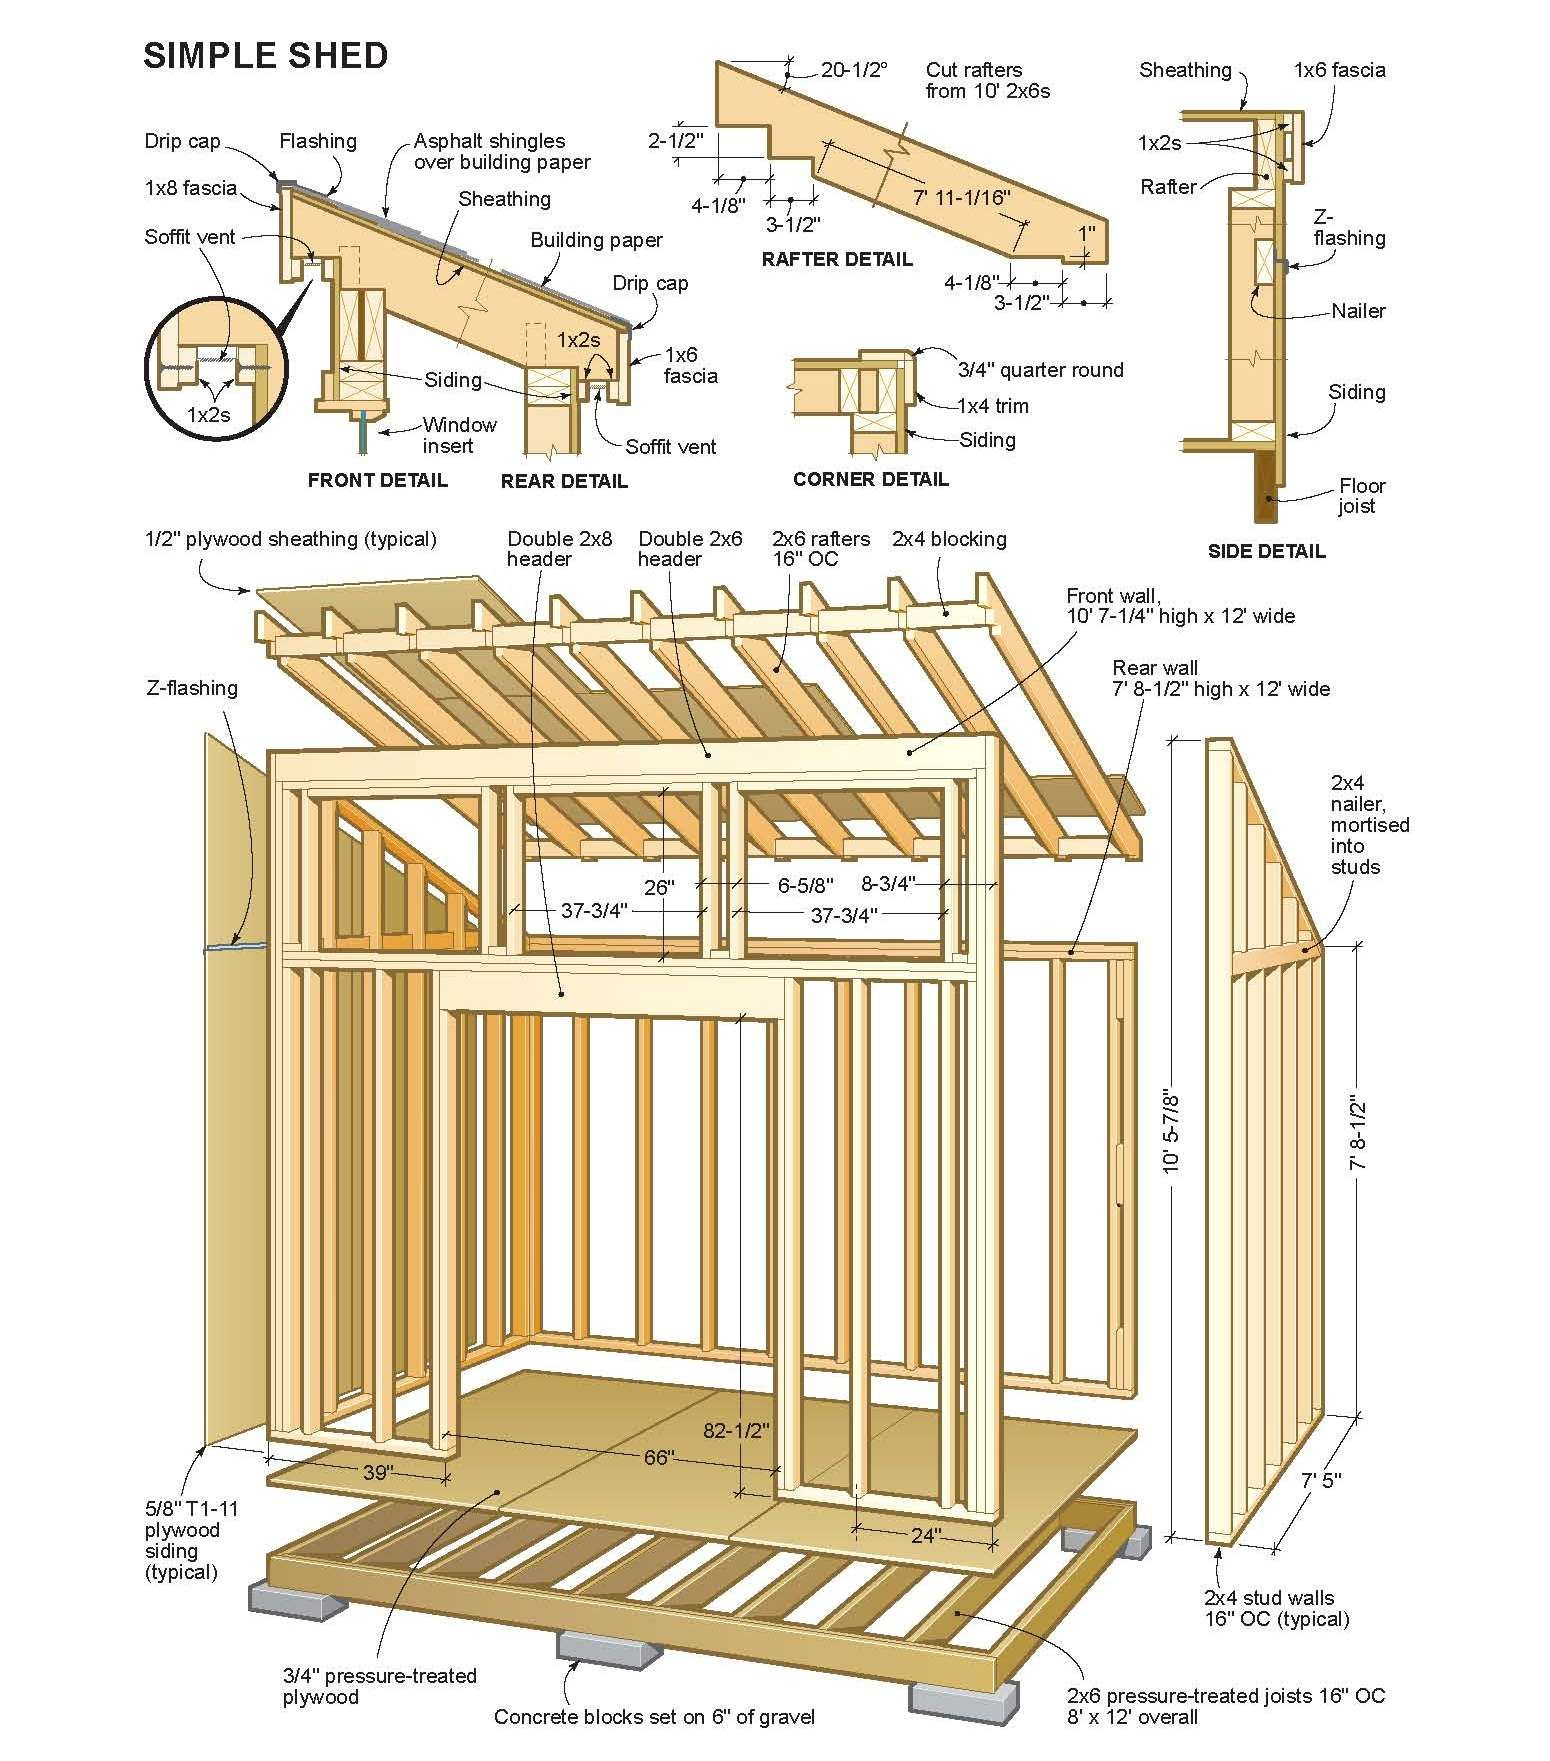 Free Country Simple Shed Plans | Abri De Stockage, Plan ... avec Plan Abri De Jardin En Bois